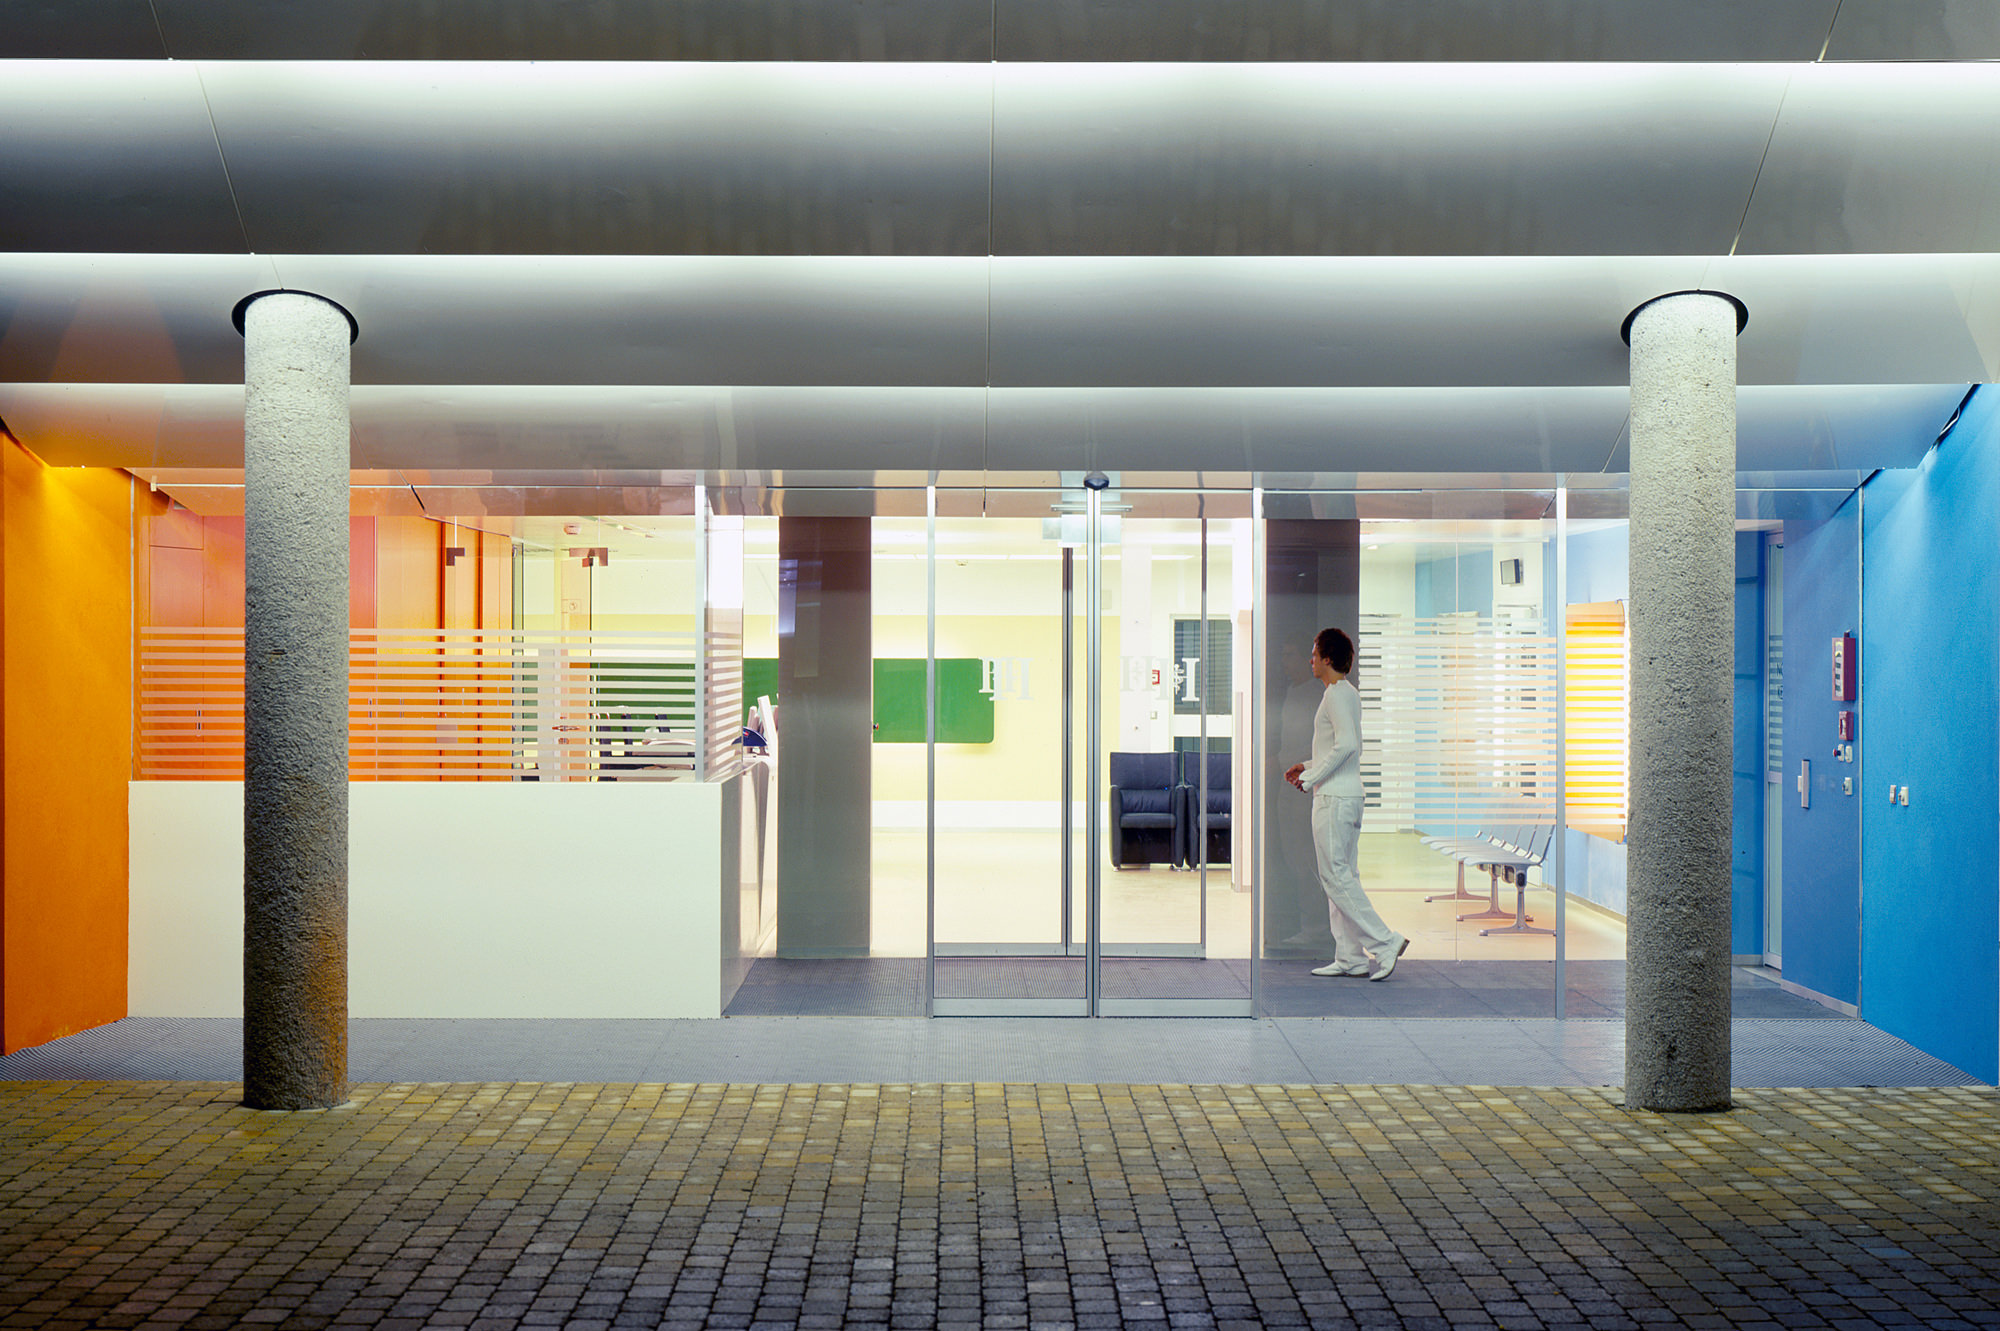 krankenhaus_kitzbuehel_04_umbau_sanierung__junger_beer_architektur